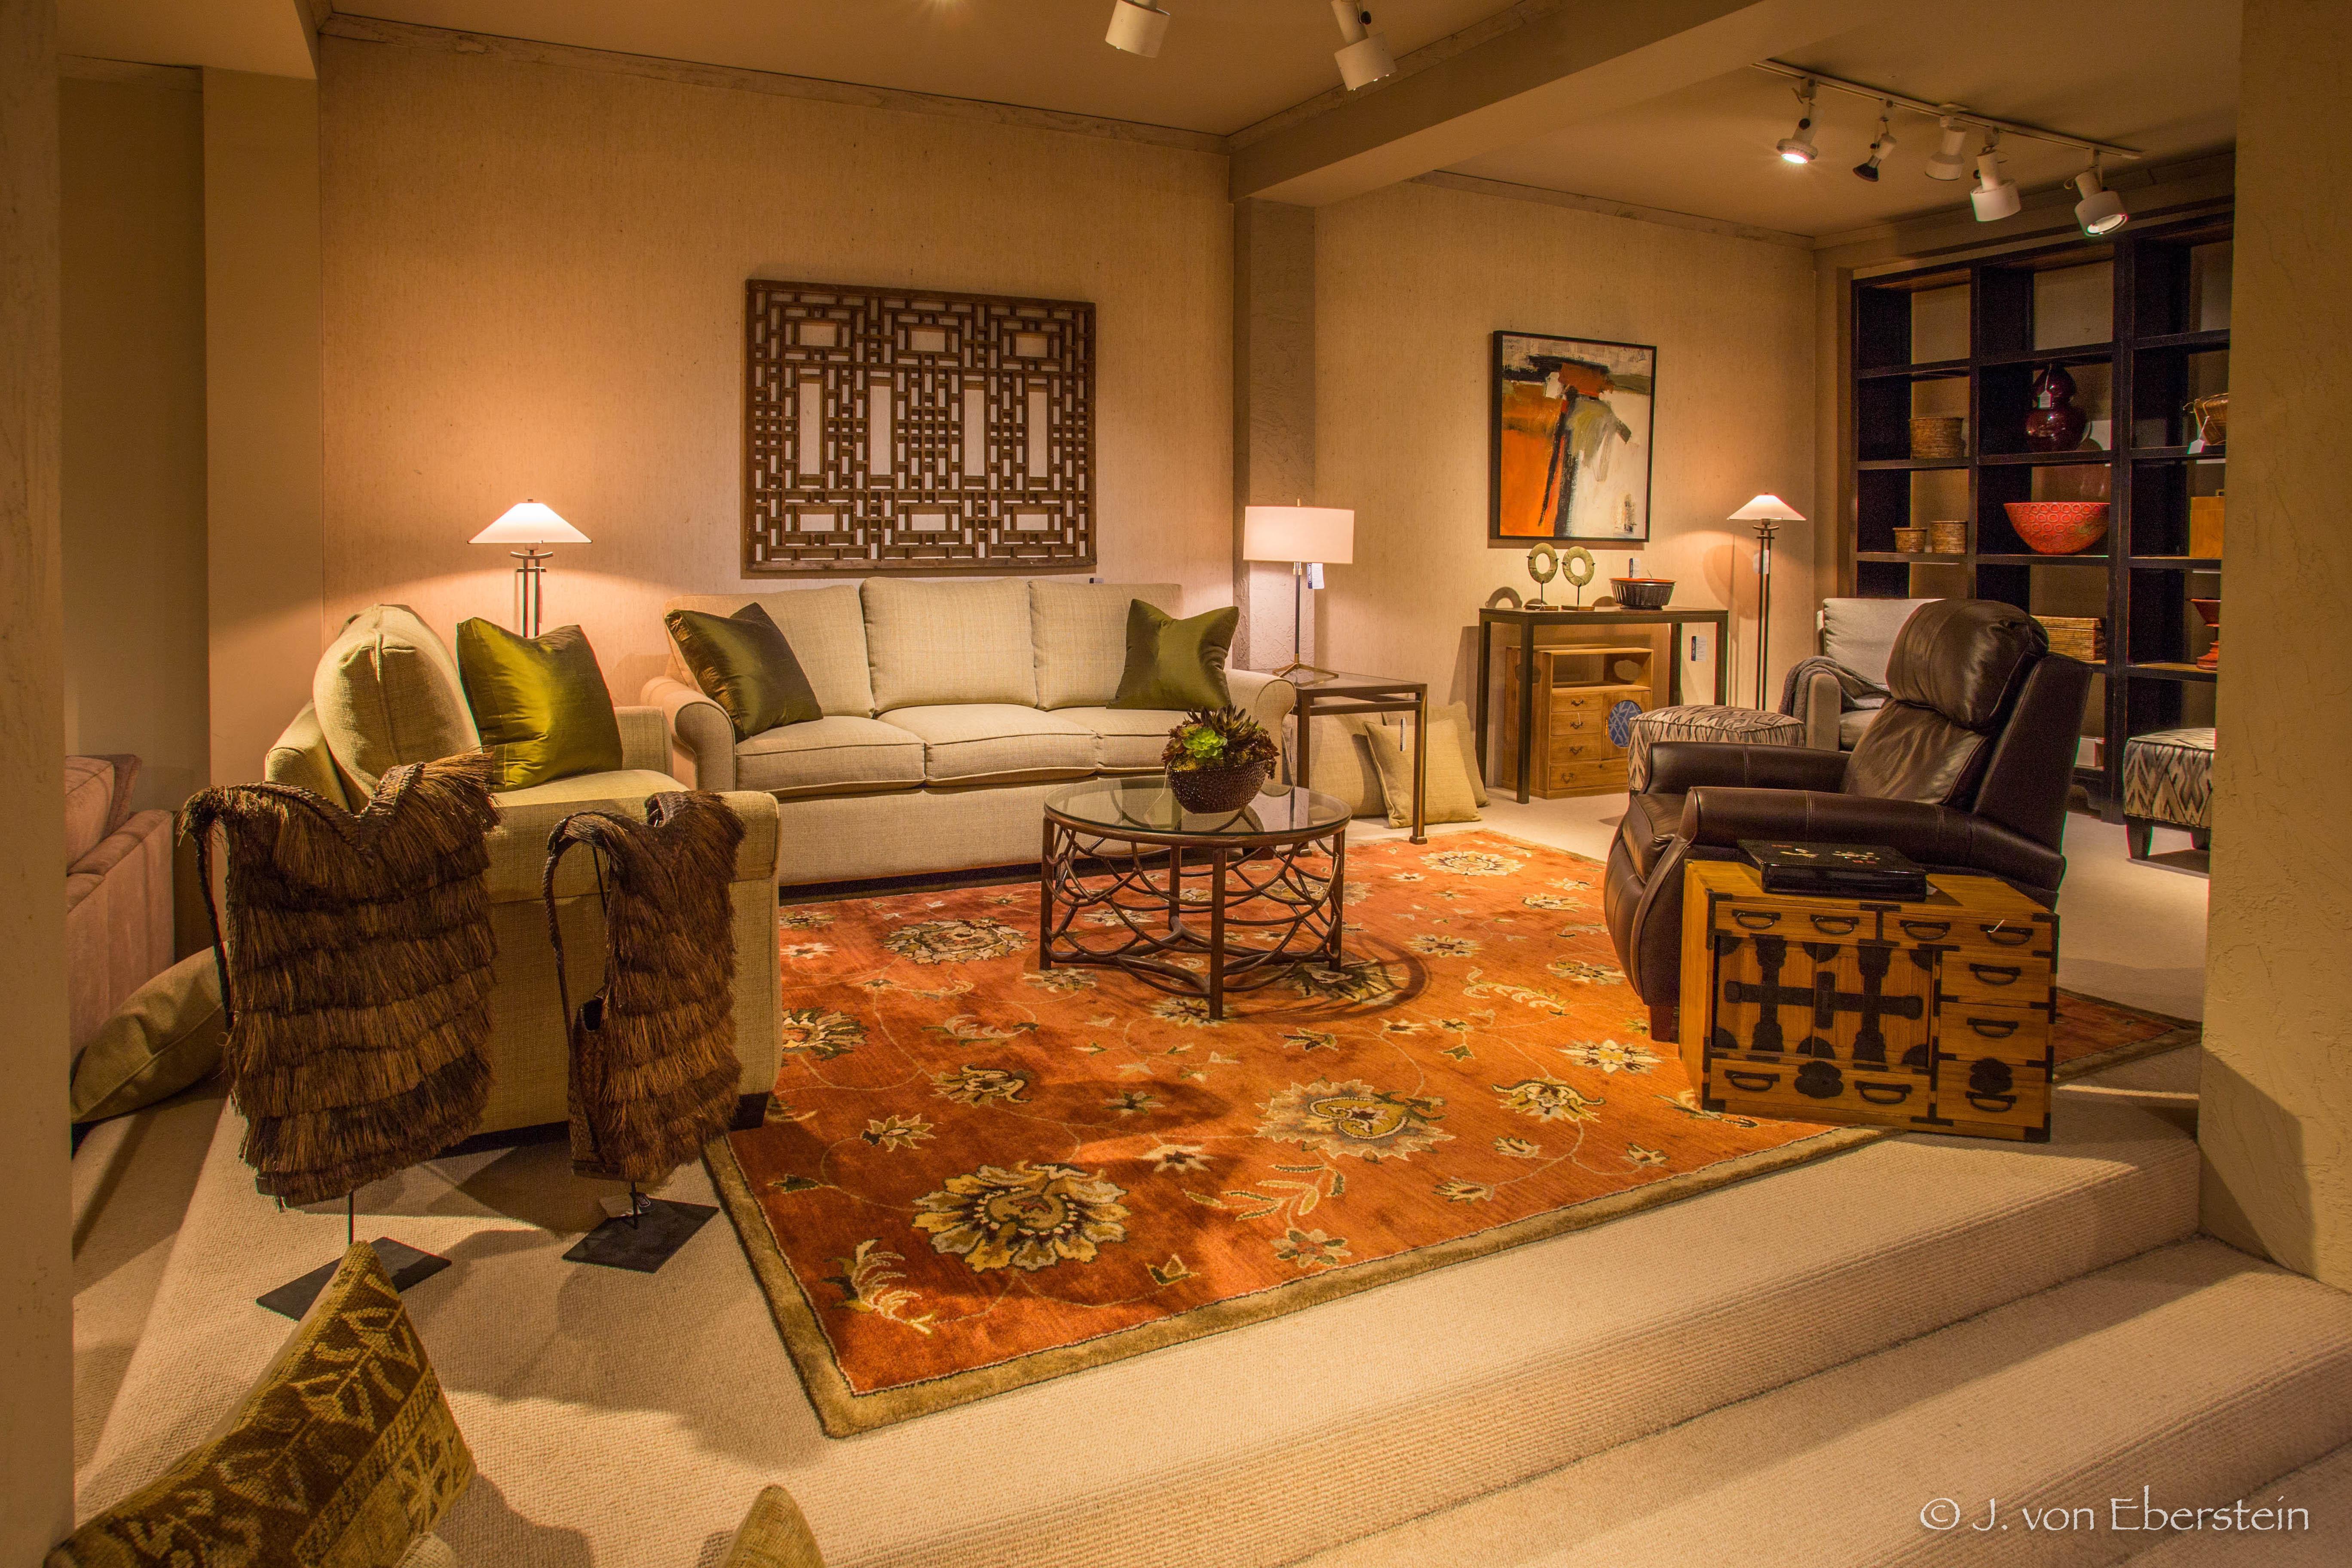 Del-Teet Furniture, Bellevue, WA